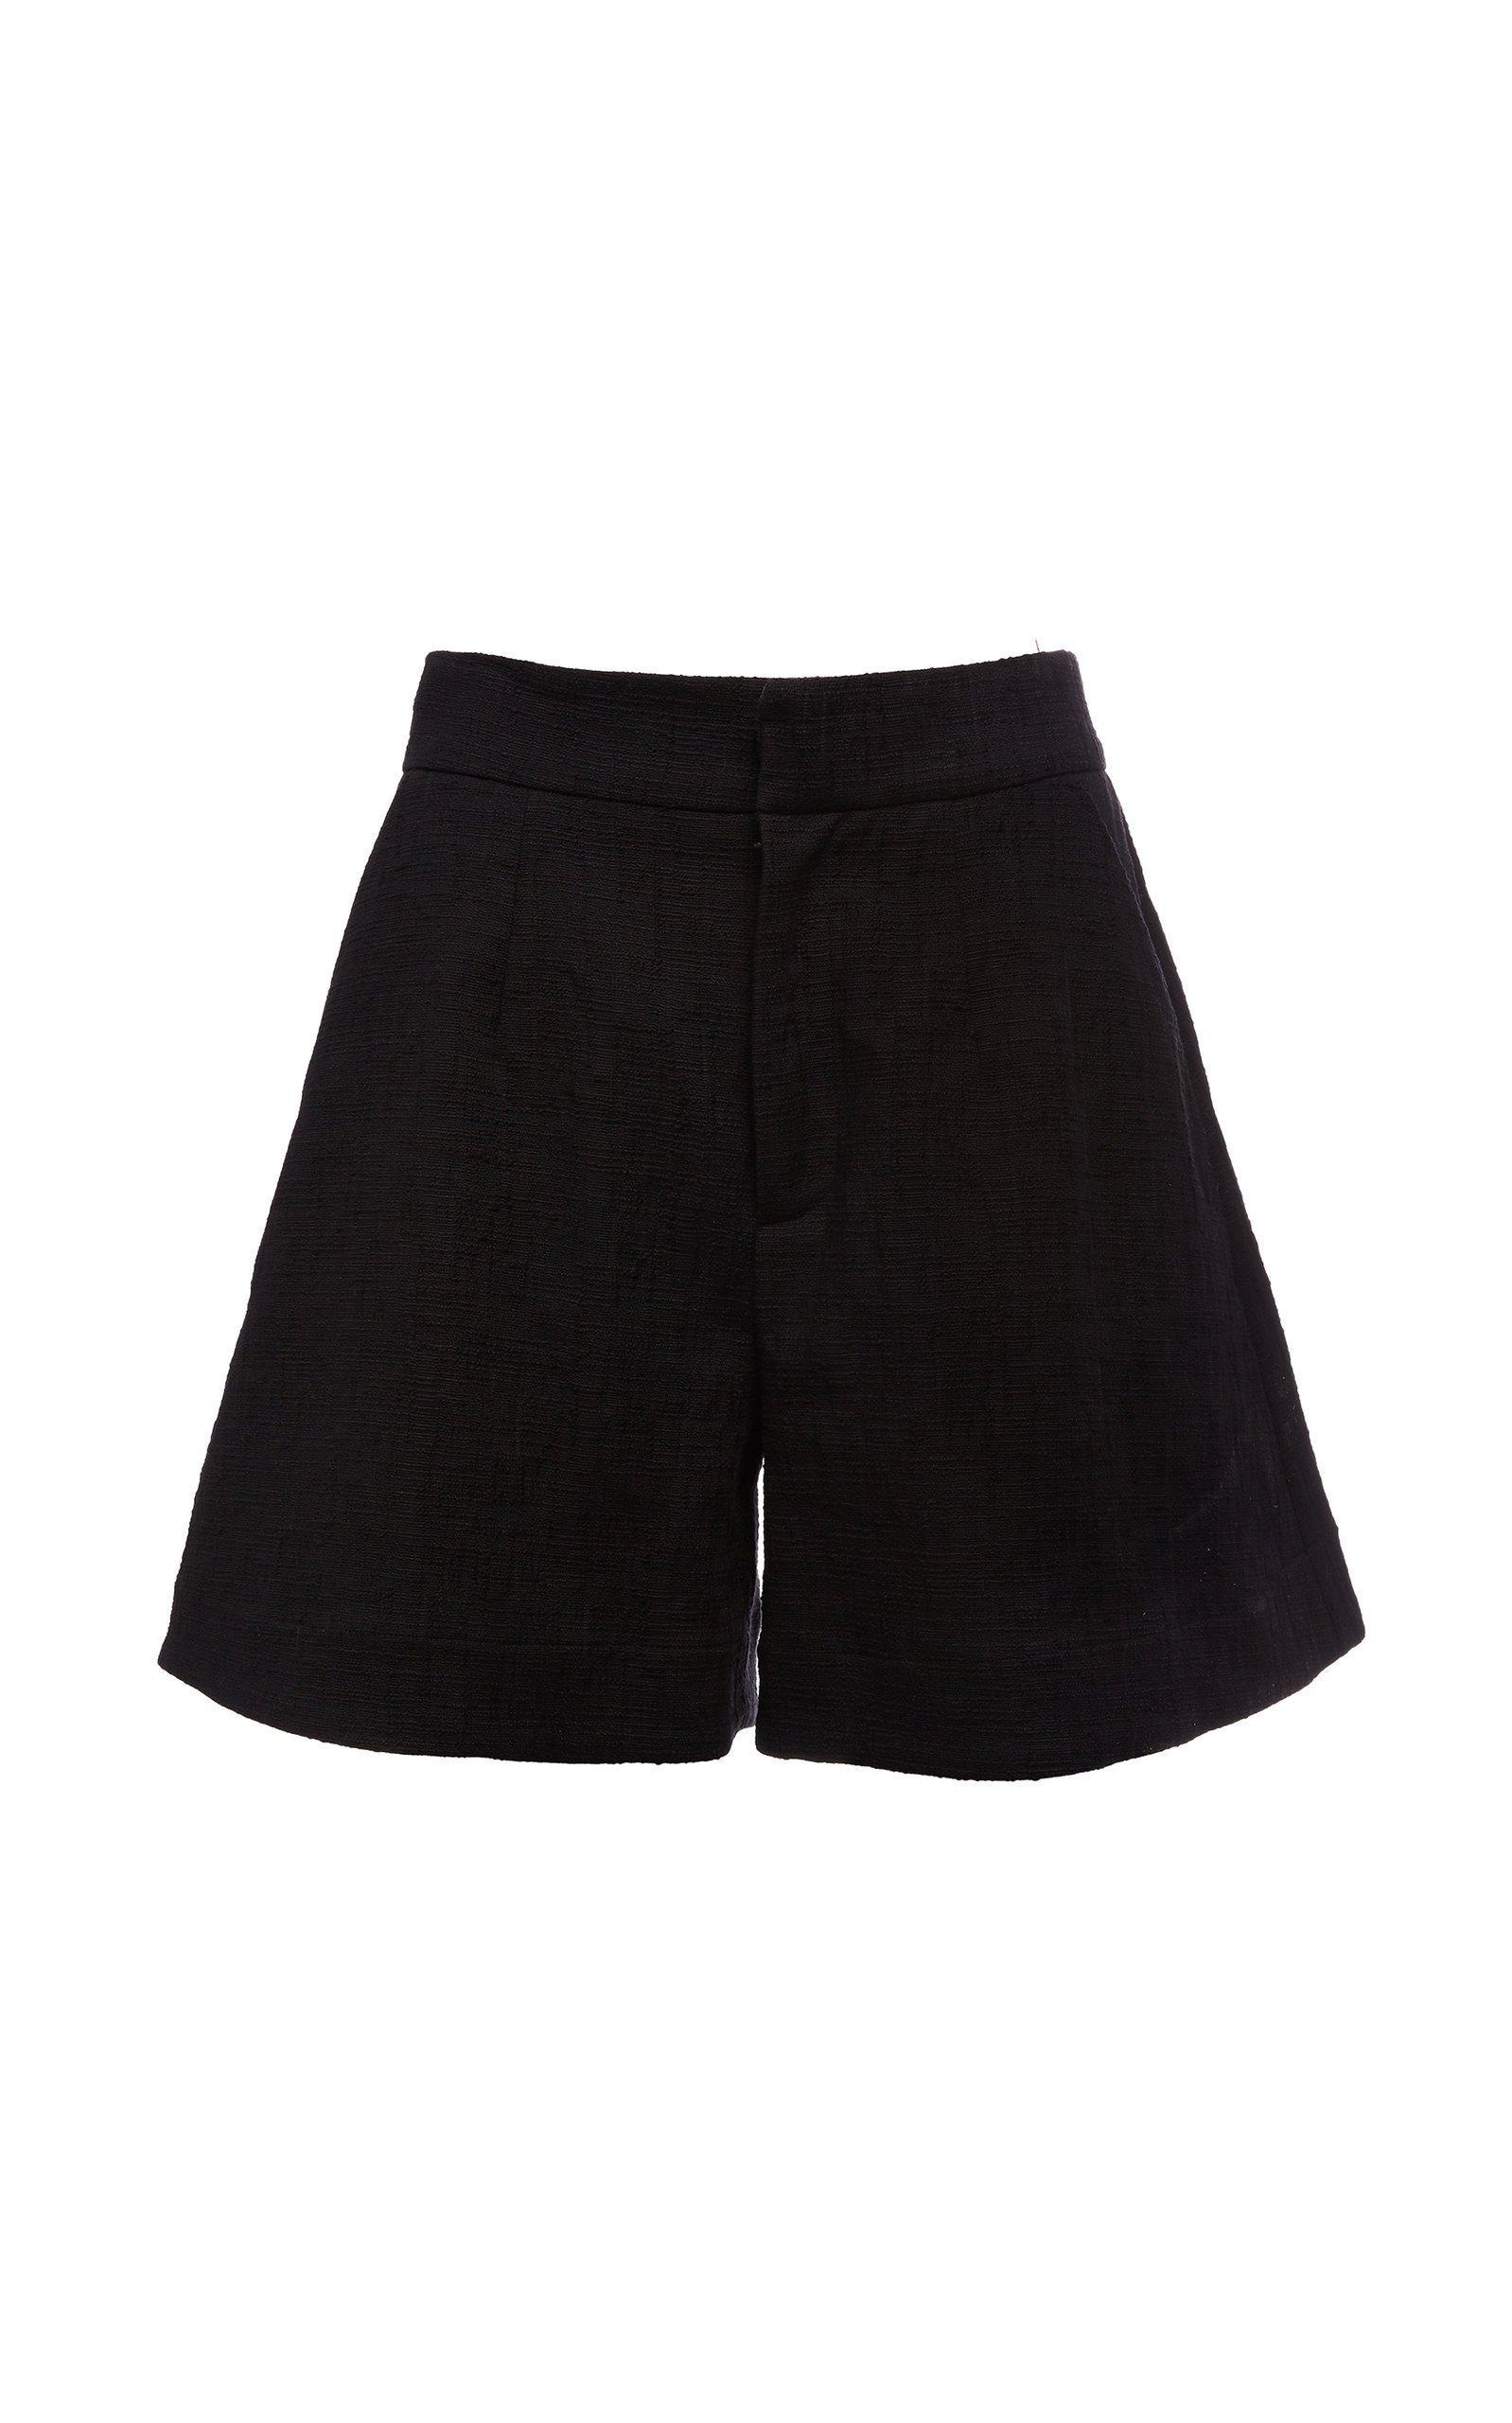 La DoubleJ Good Butt High-Rise Cotton Shorts Size: XS